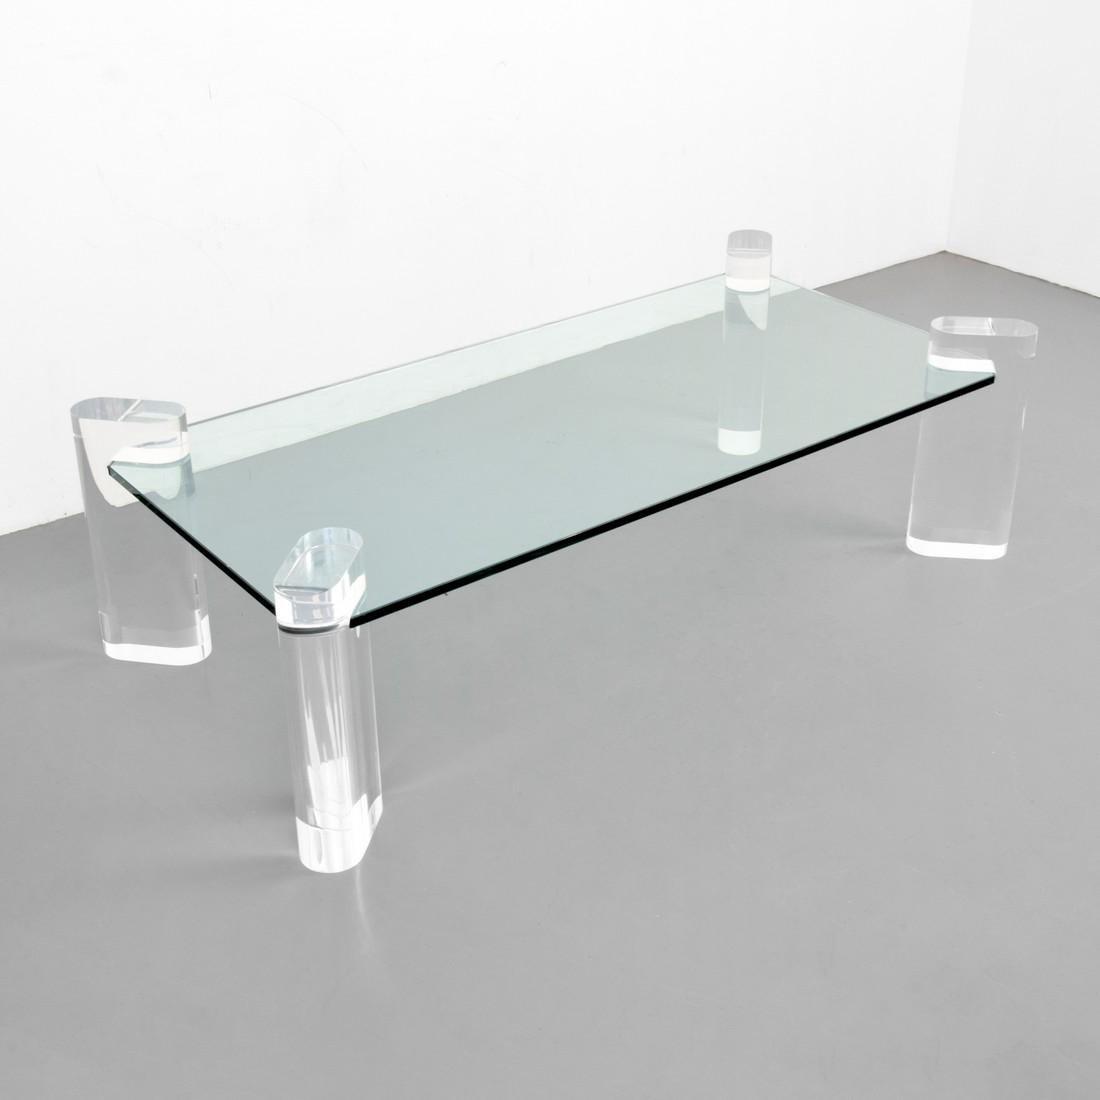 Large Karl Springer Coffee Table - 6